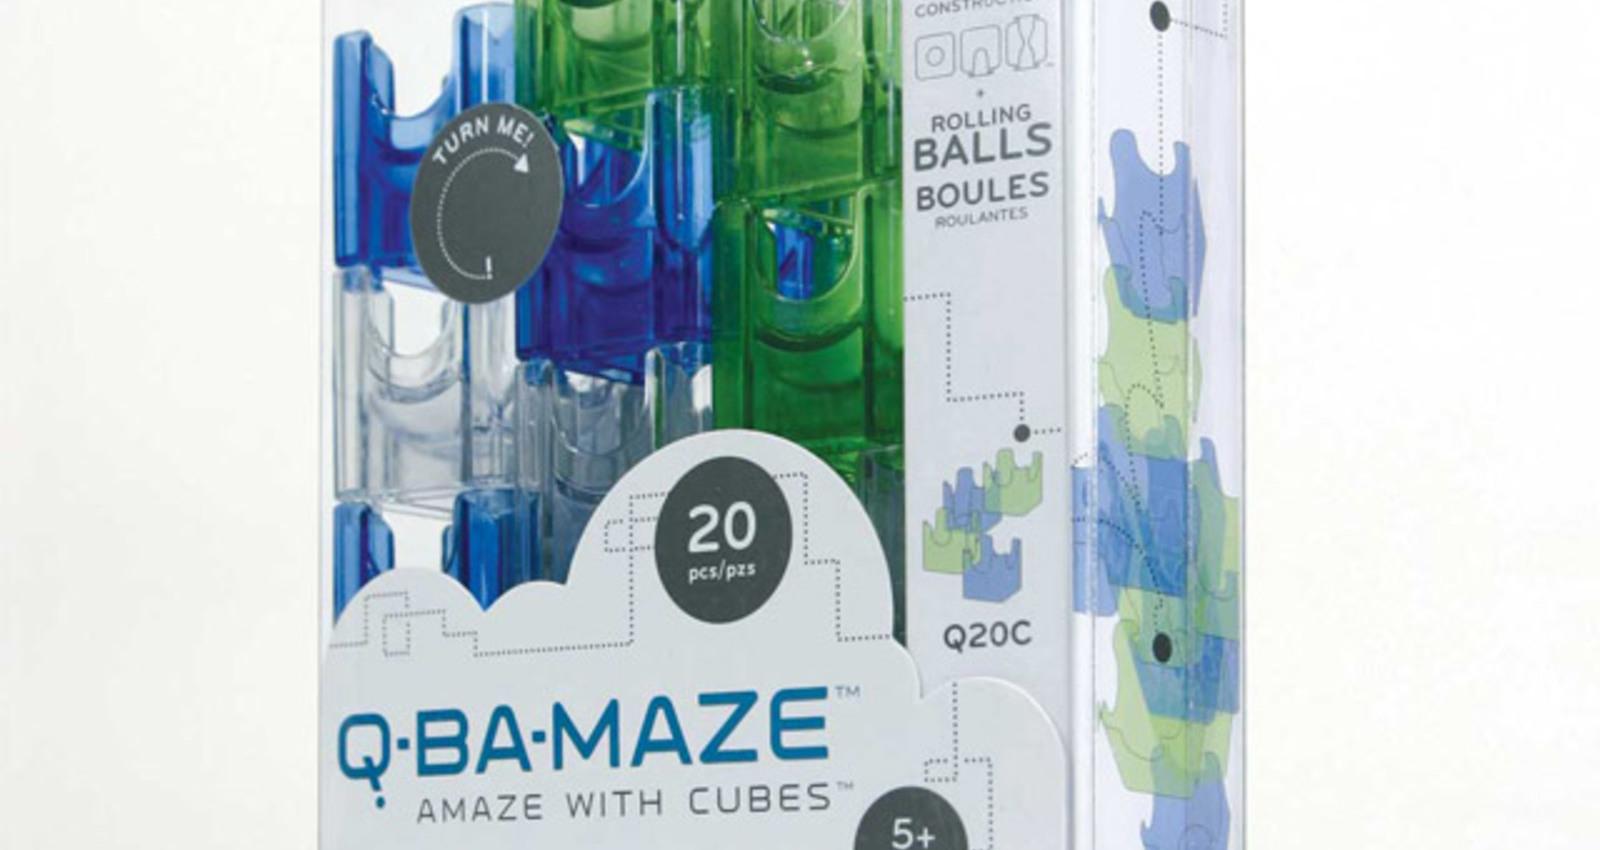 Q-BA-MAZE Box